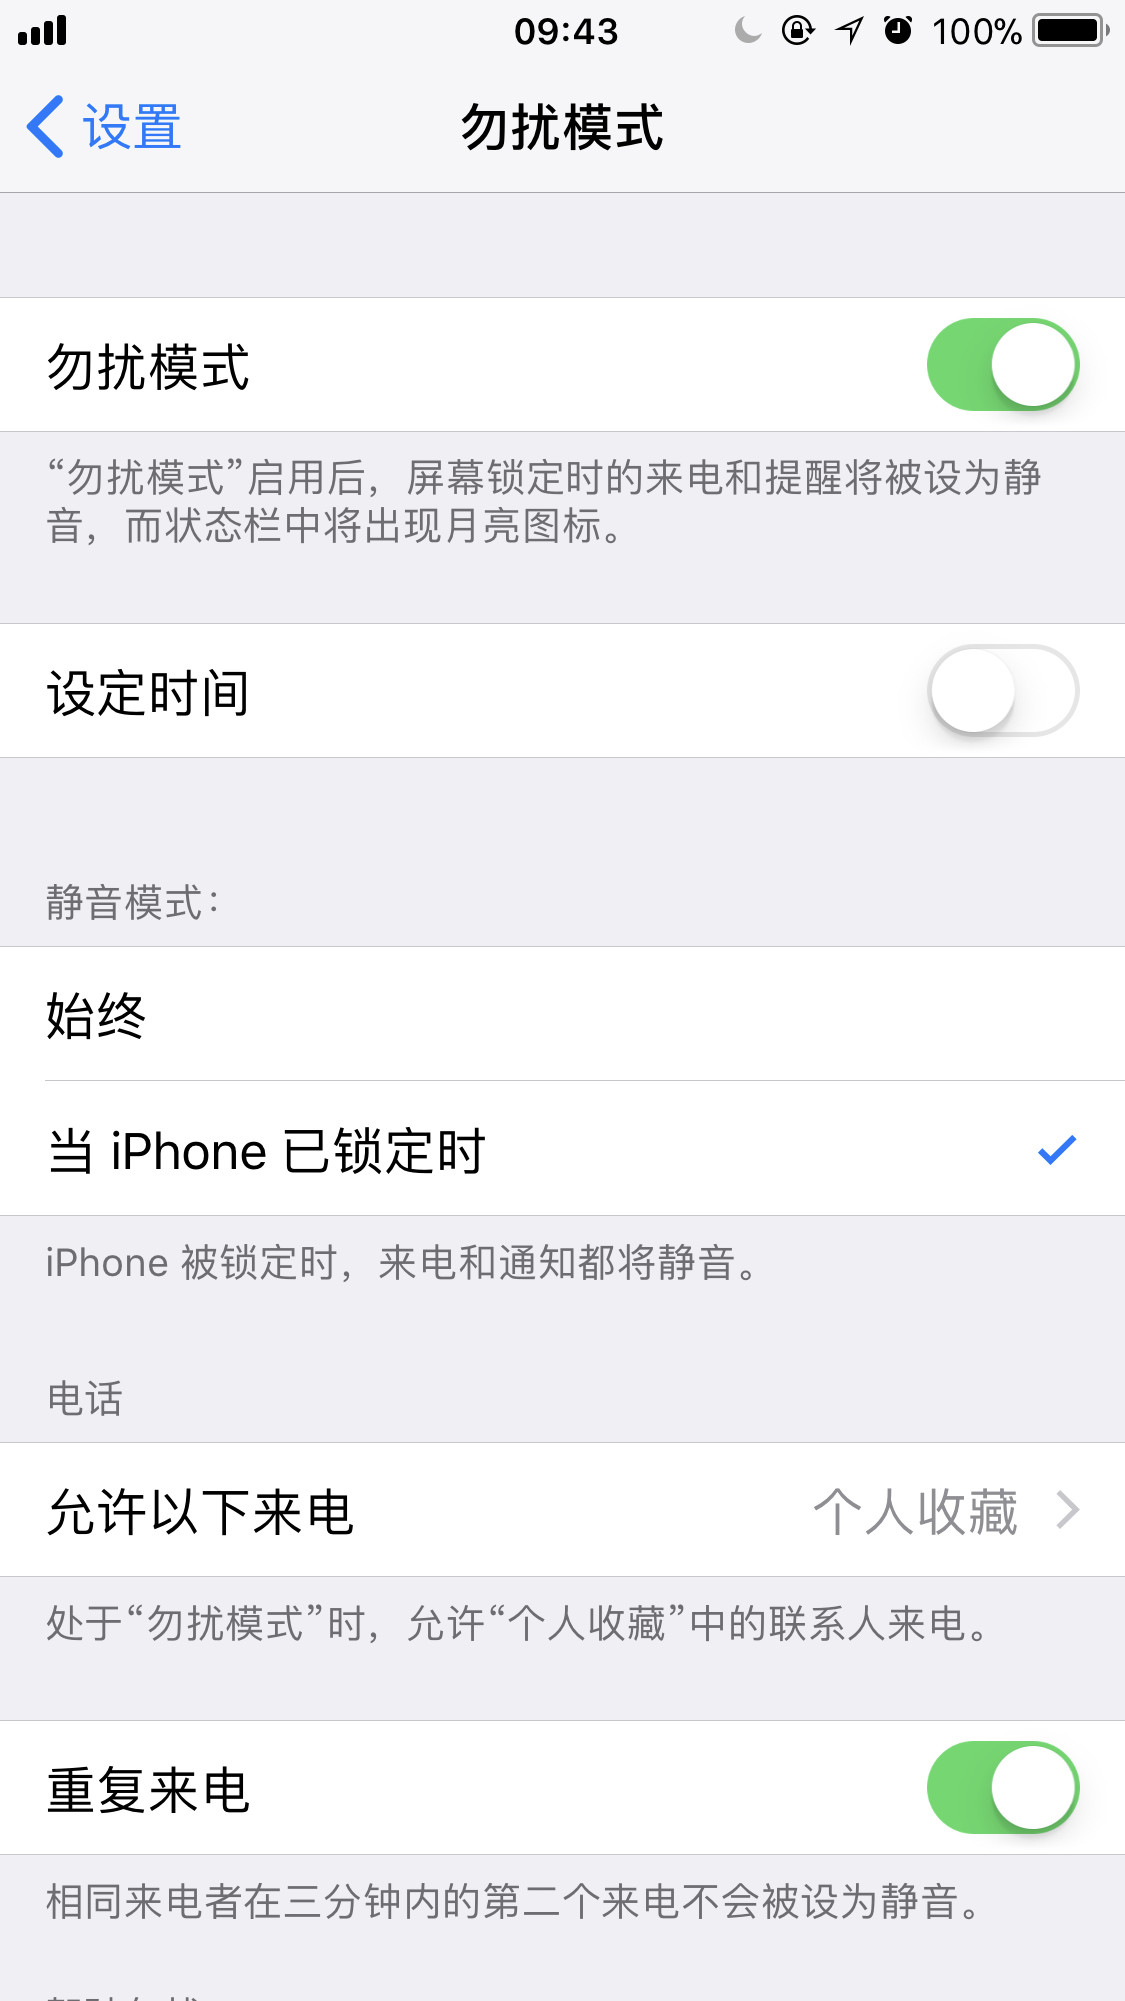 iPhone 紧急来电例外规则是什么?